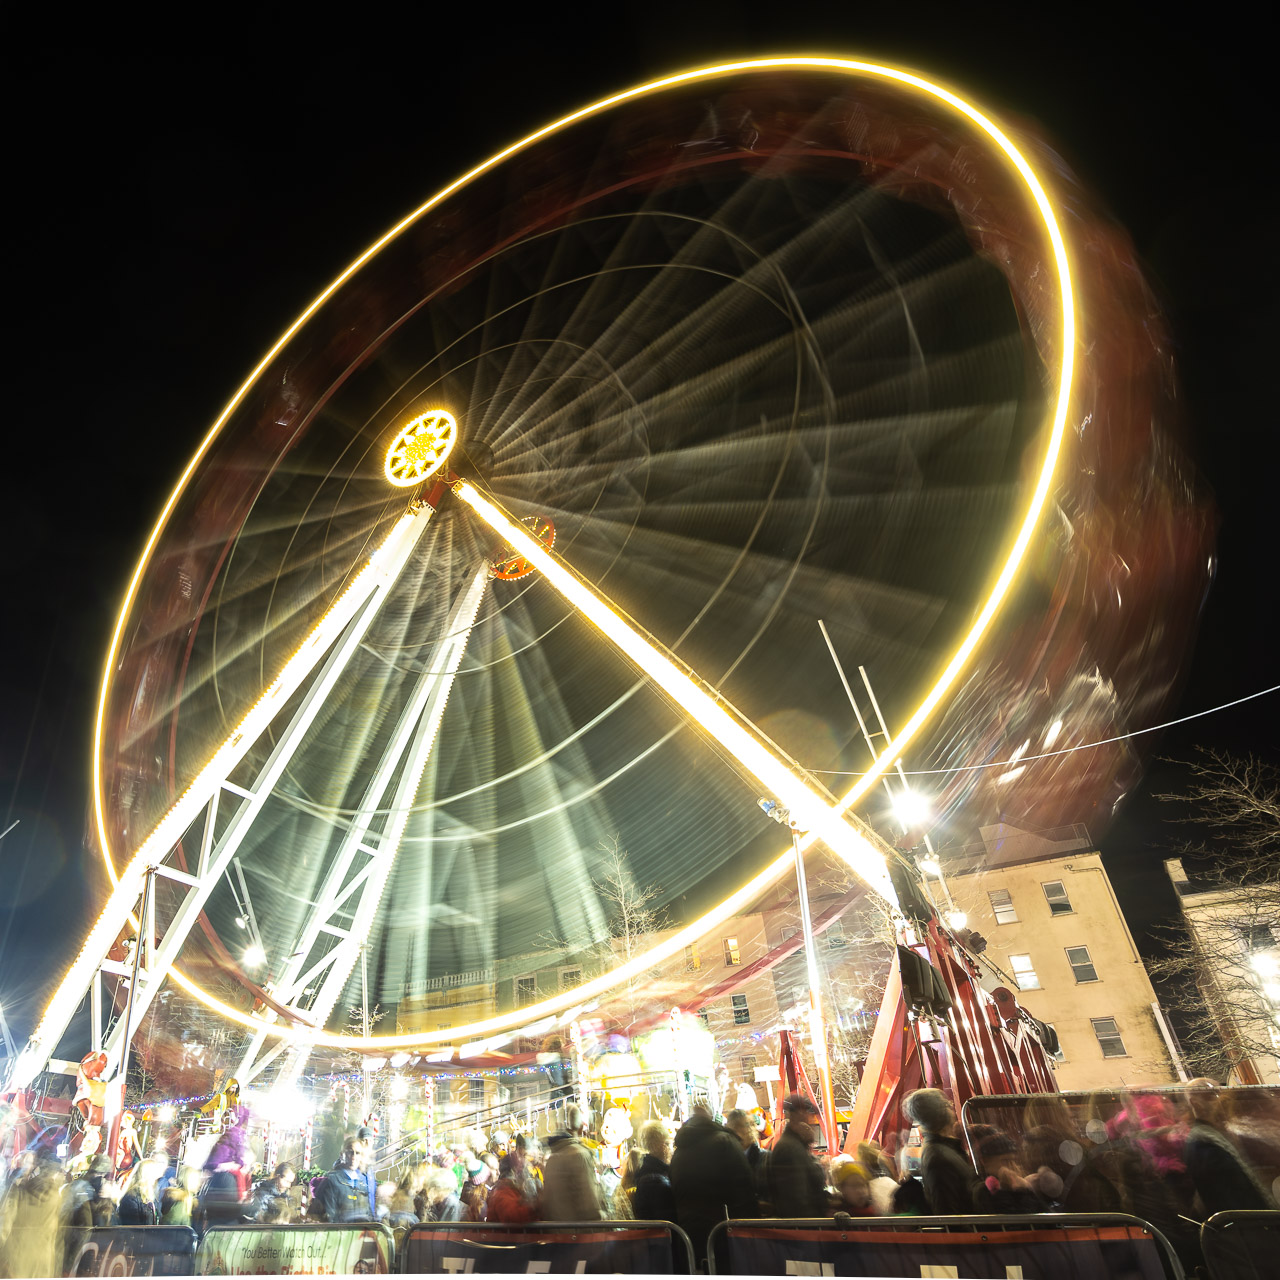 Cork's Ferris Wheel